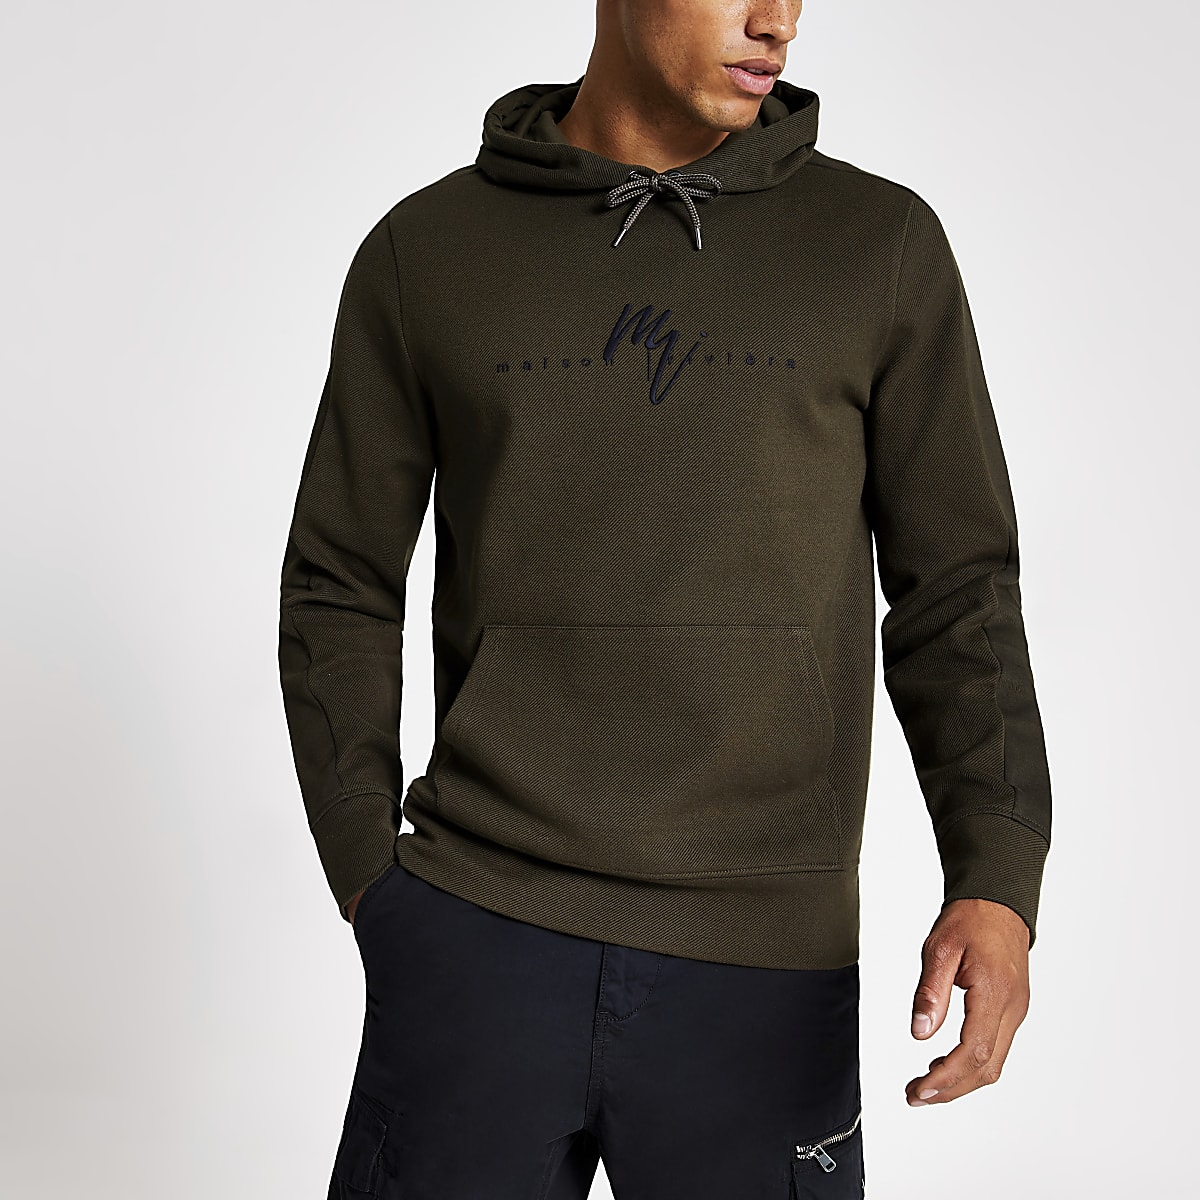 Khaki twill Maison Riviera slim fit hoodie